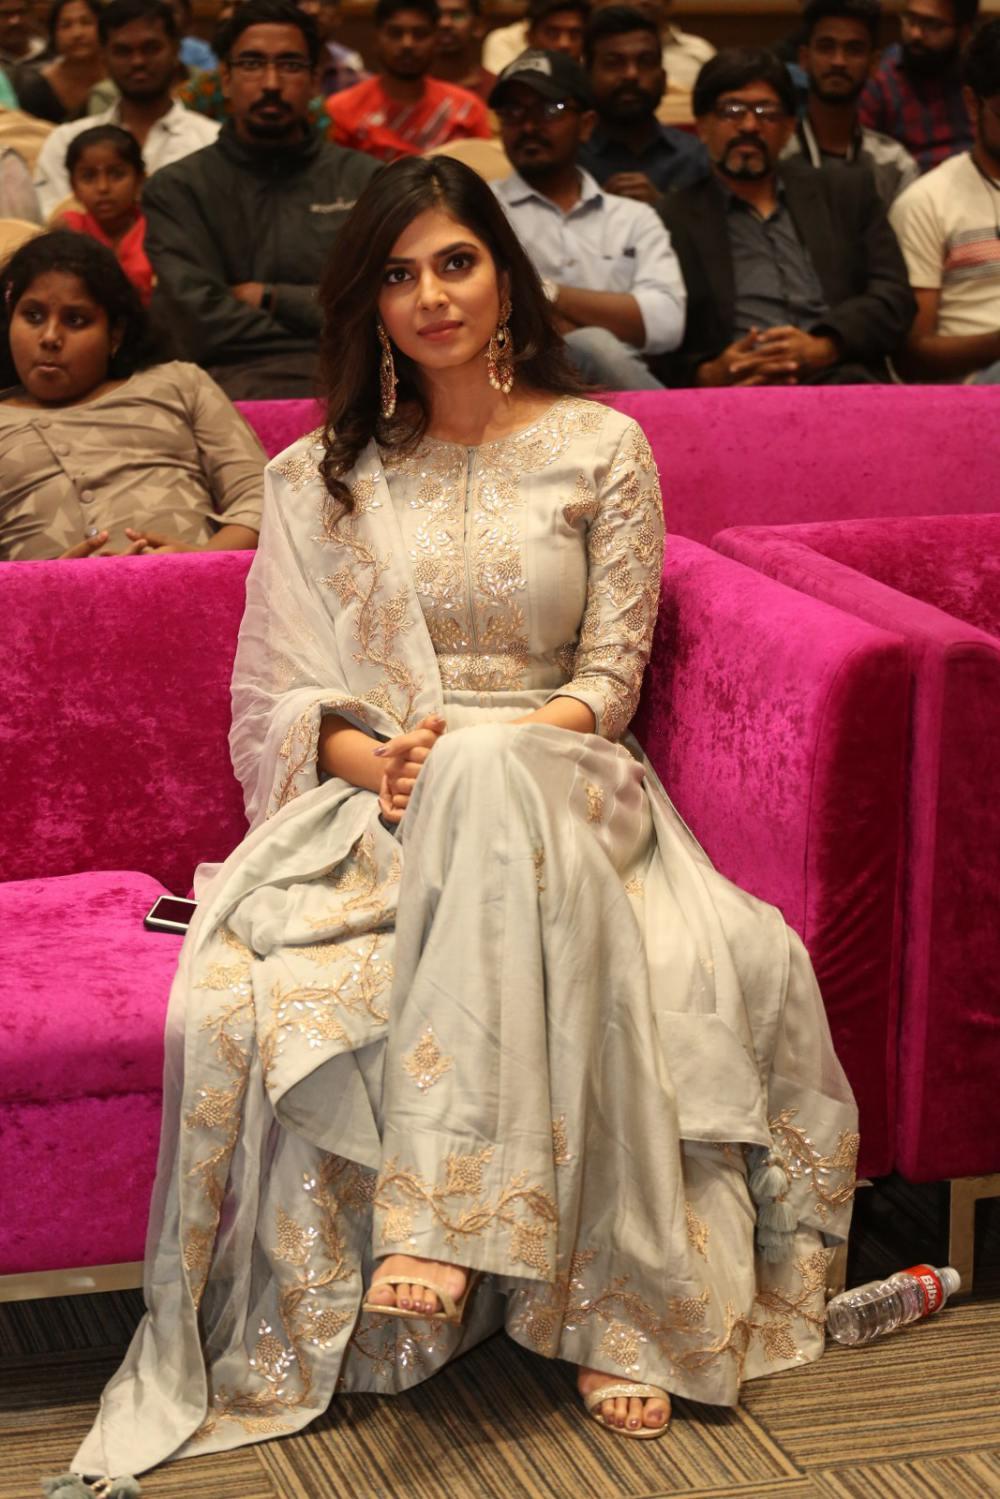 Malavika Mohanan at peta movie audio launch (2)